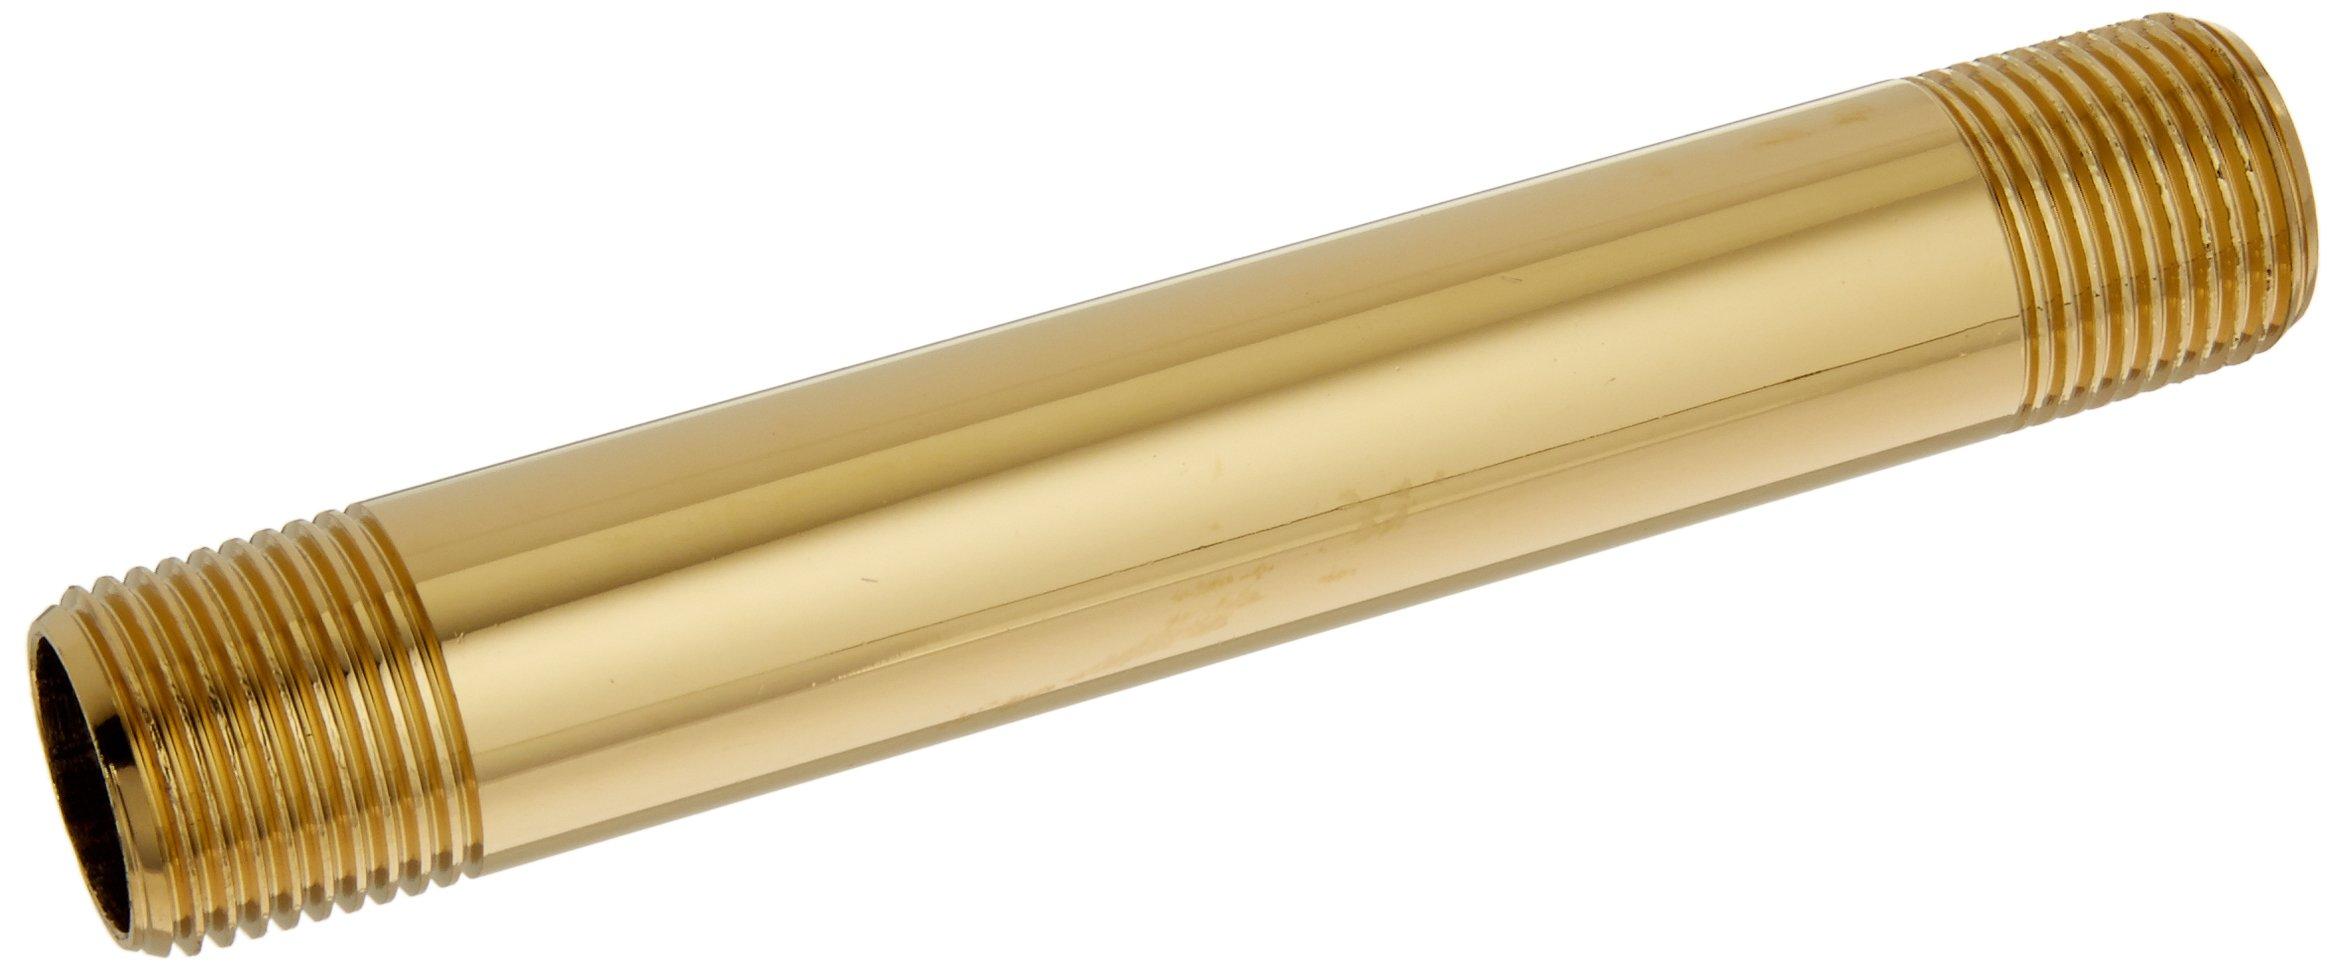 Jones Stephens N17375 3/8 X 4-Inch Polished Brass Nipples